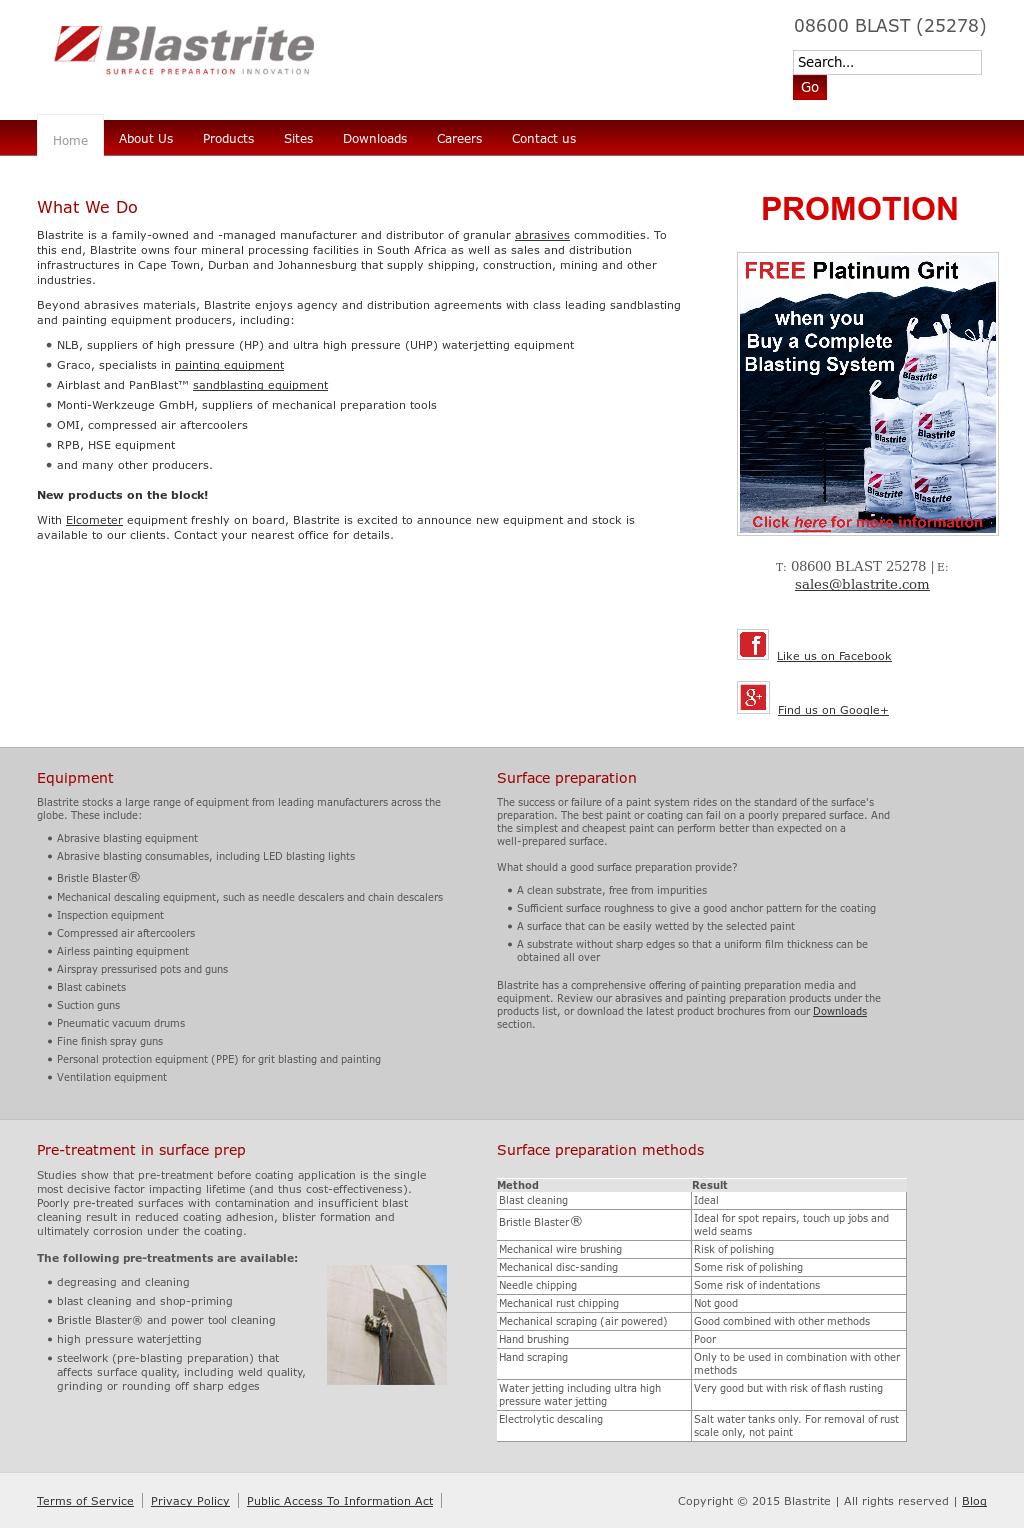 Blastrite (Pty) Competitors, Revenue and Employees - Owler